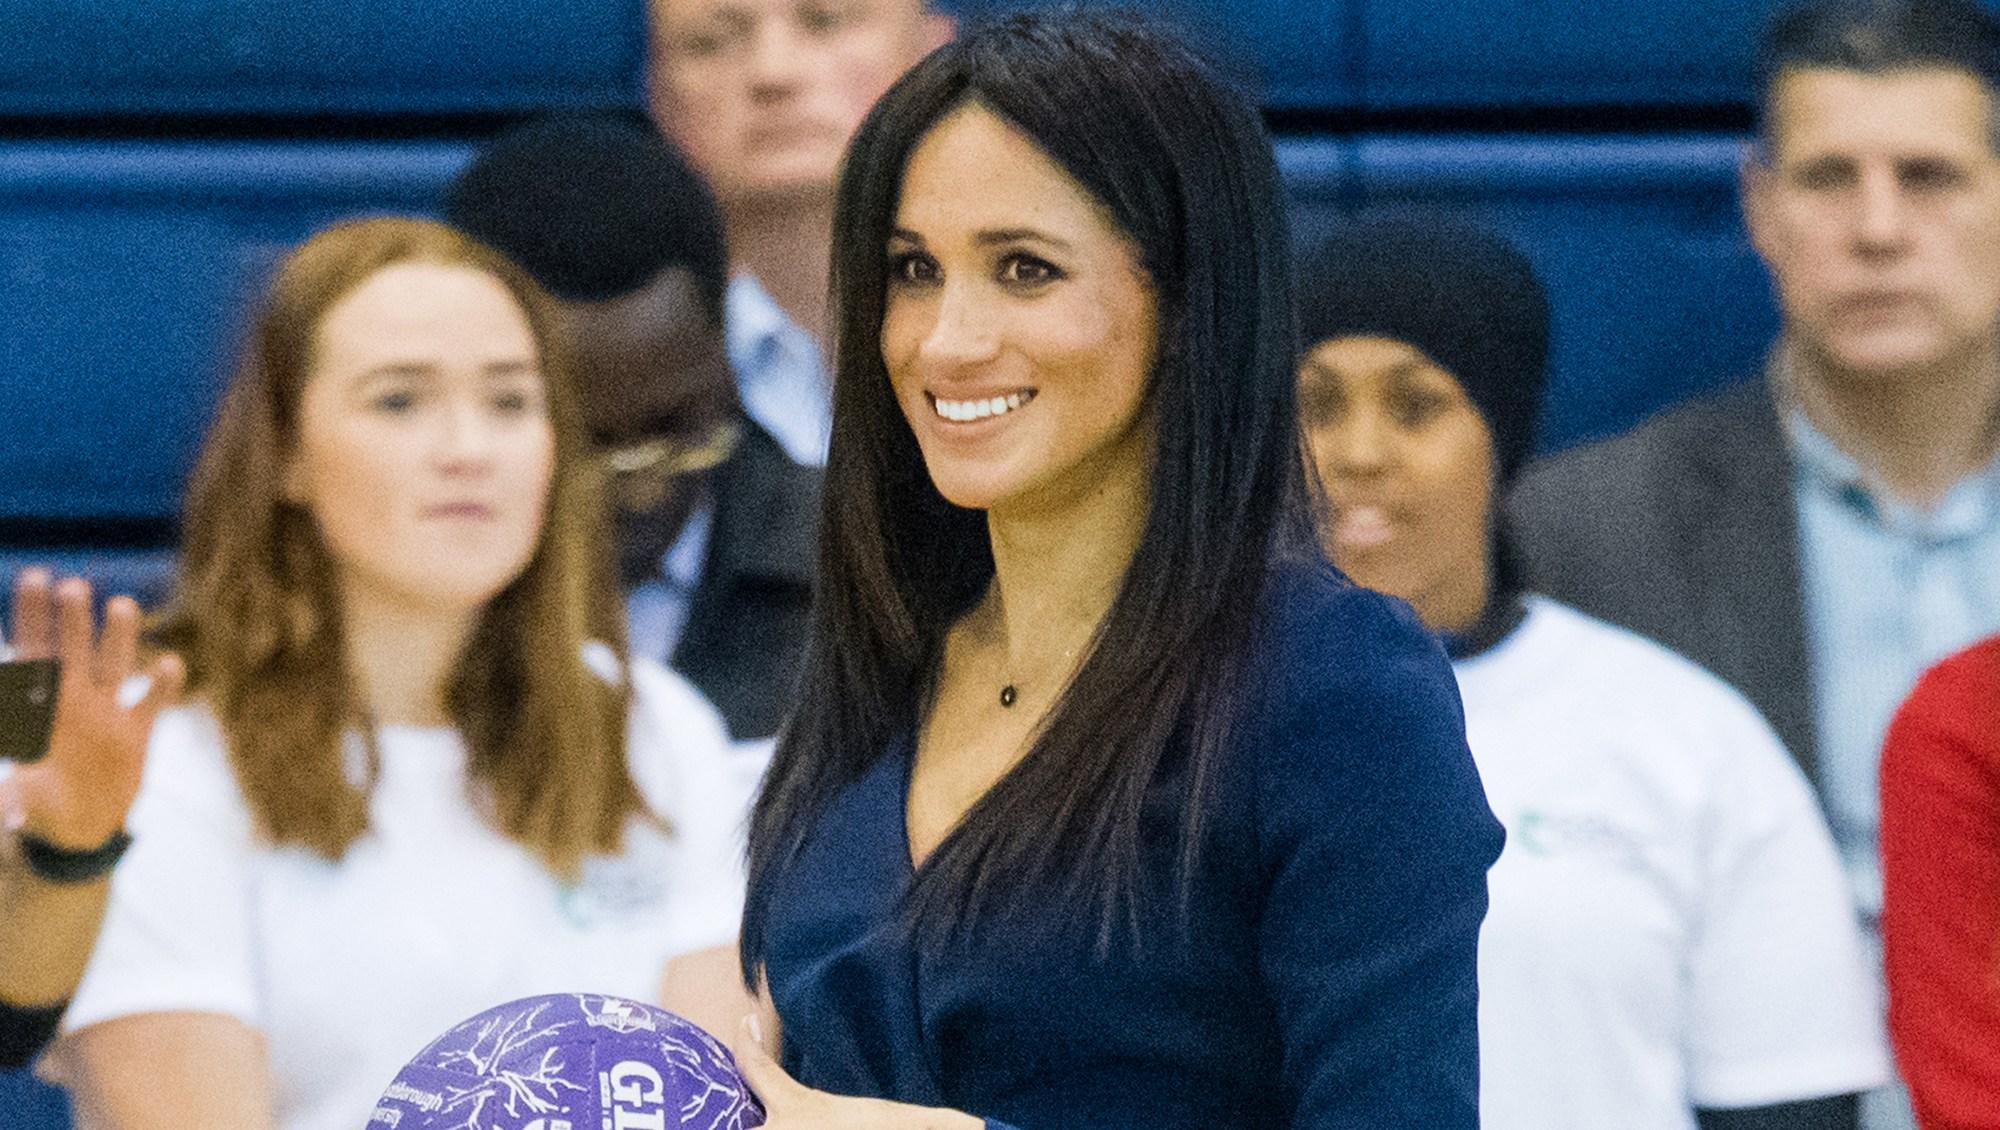 Megan Markle Plays Basketball in Oscar De La Renta and Heels at Royal Function With Prince Harry